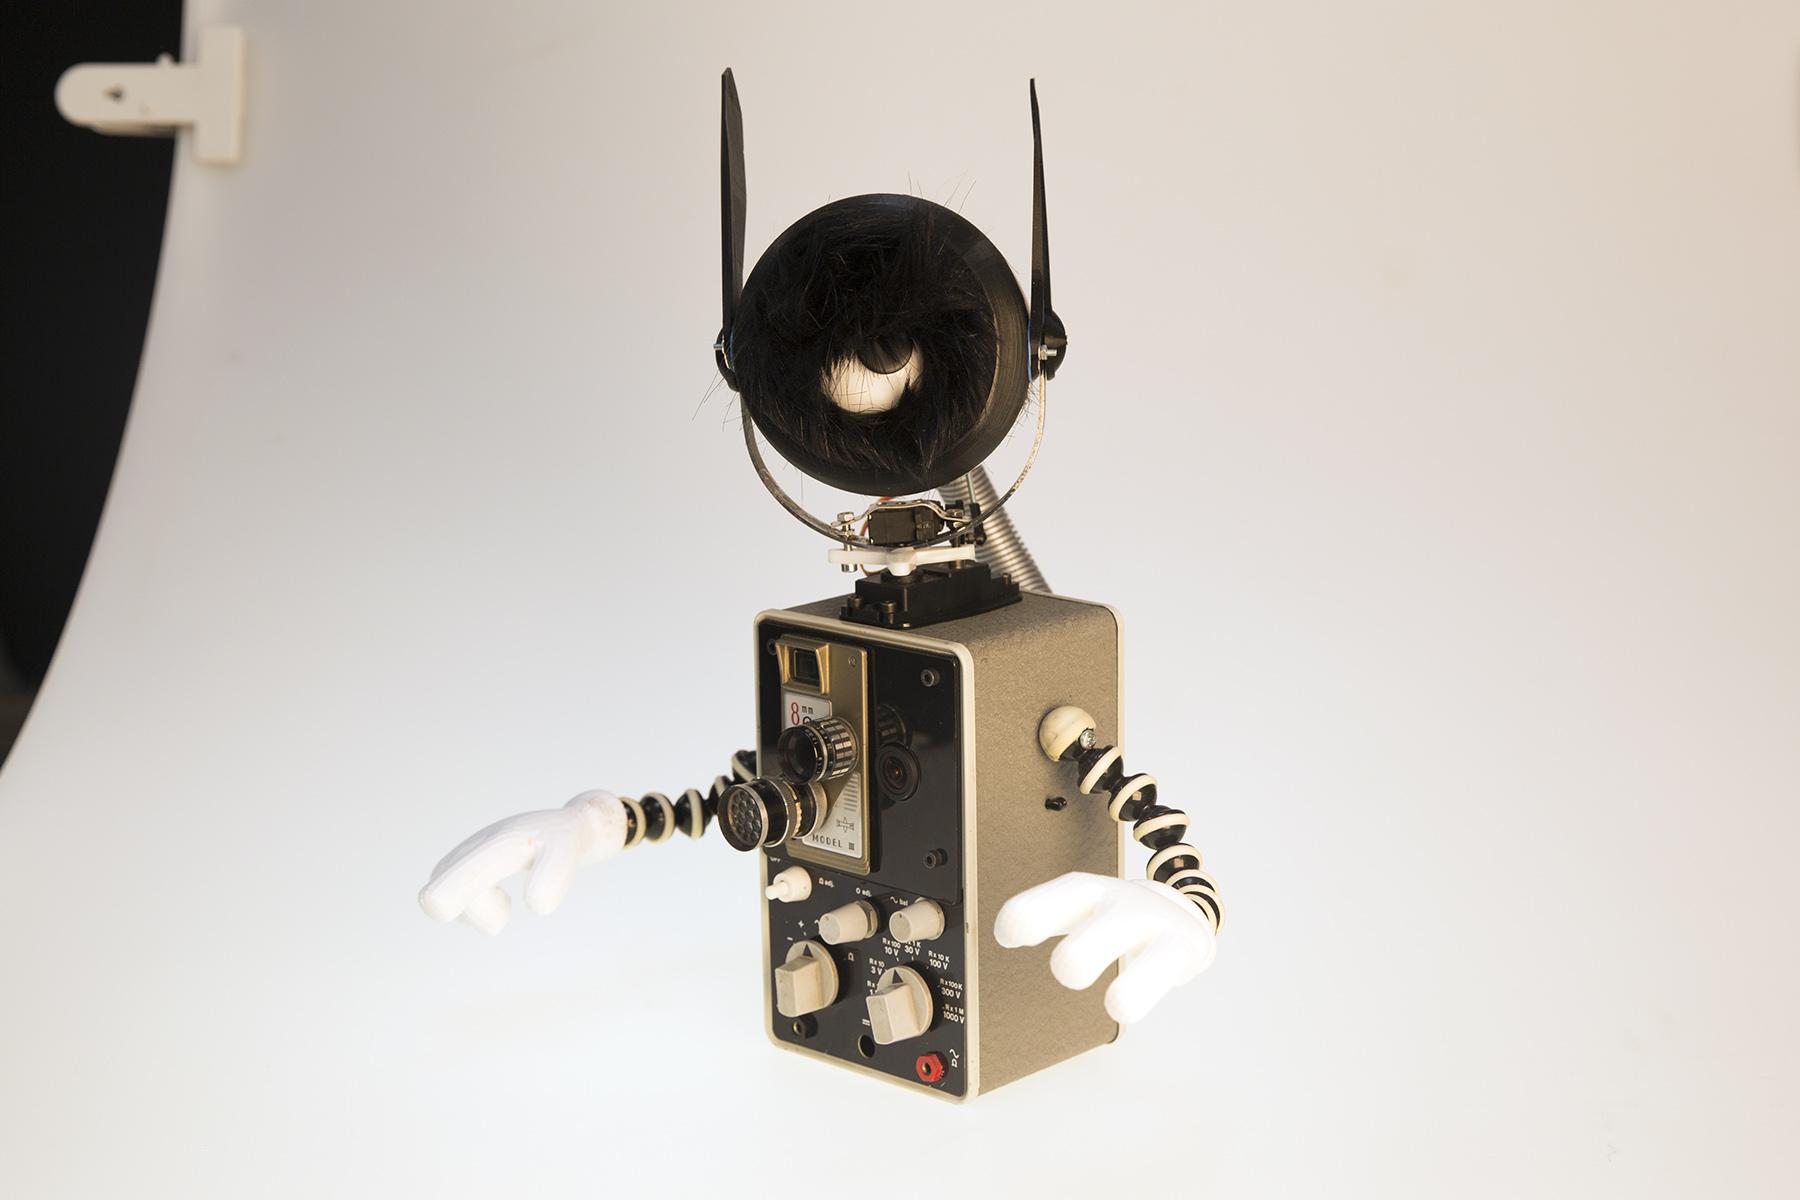 Robot gEOF